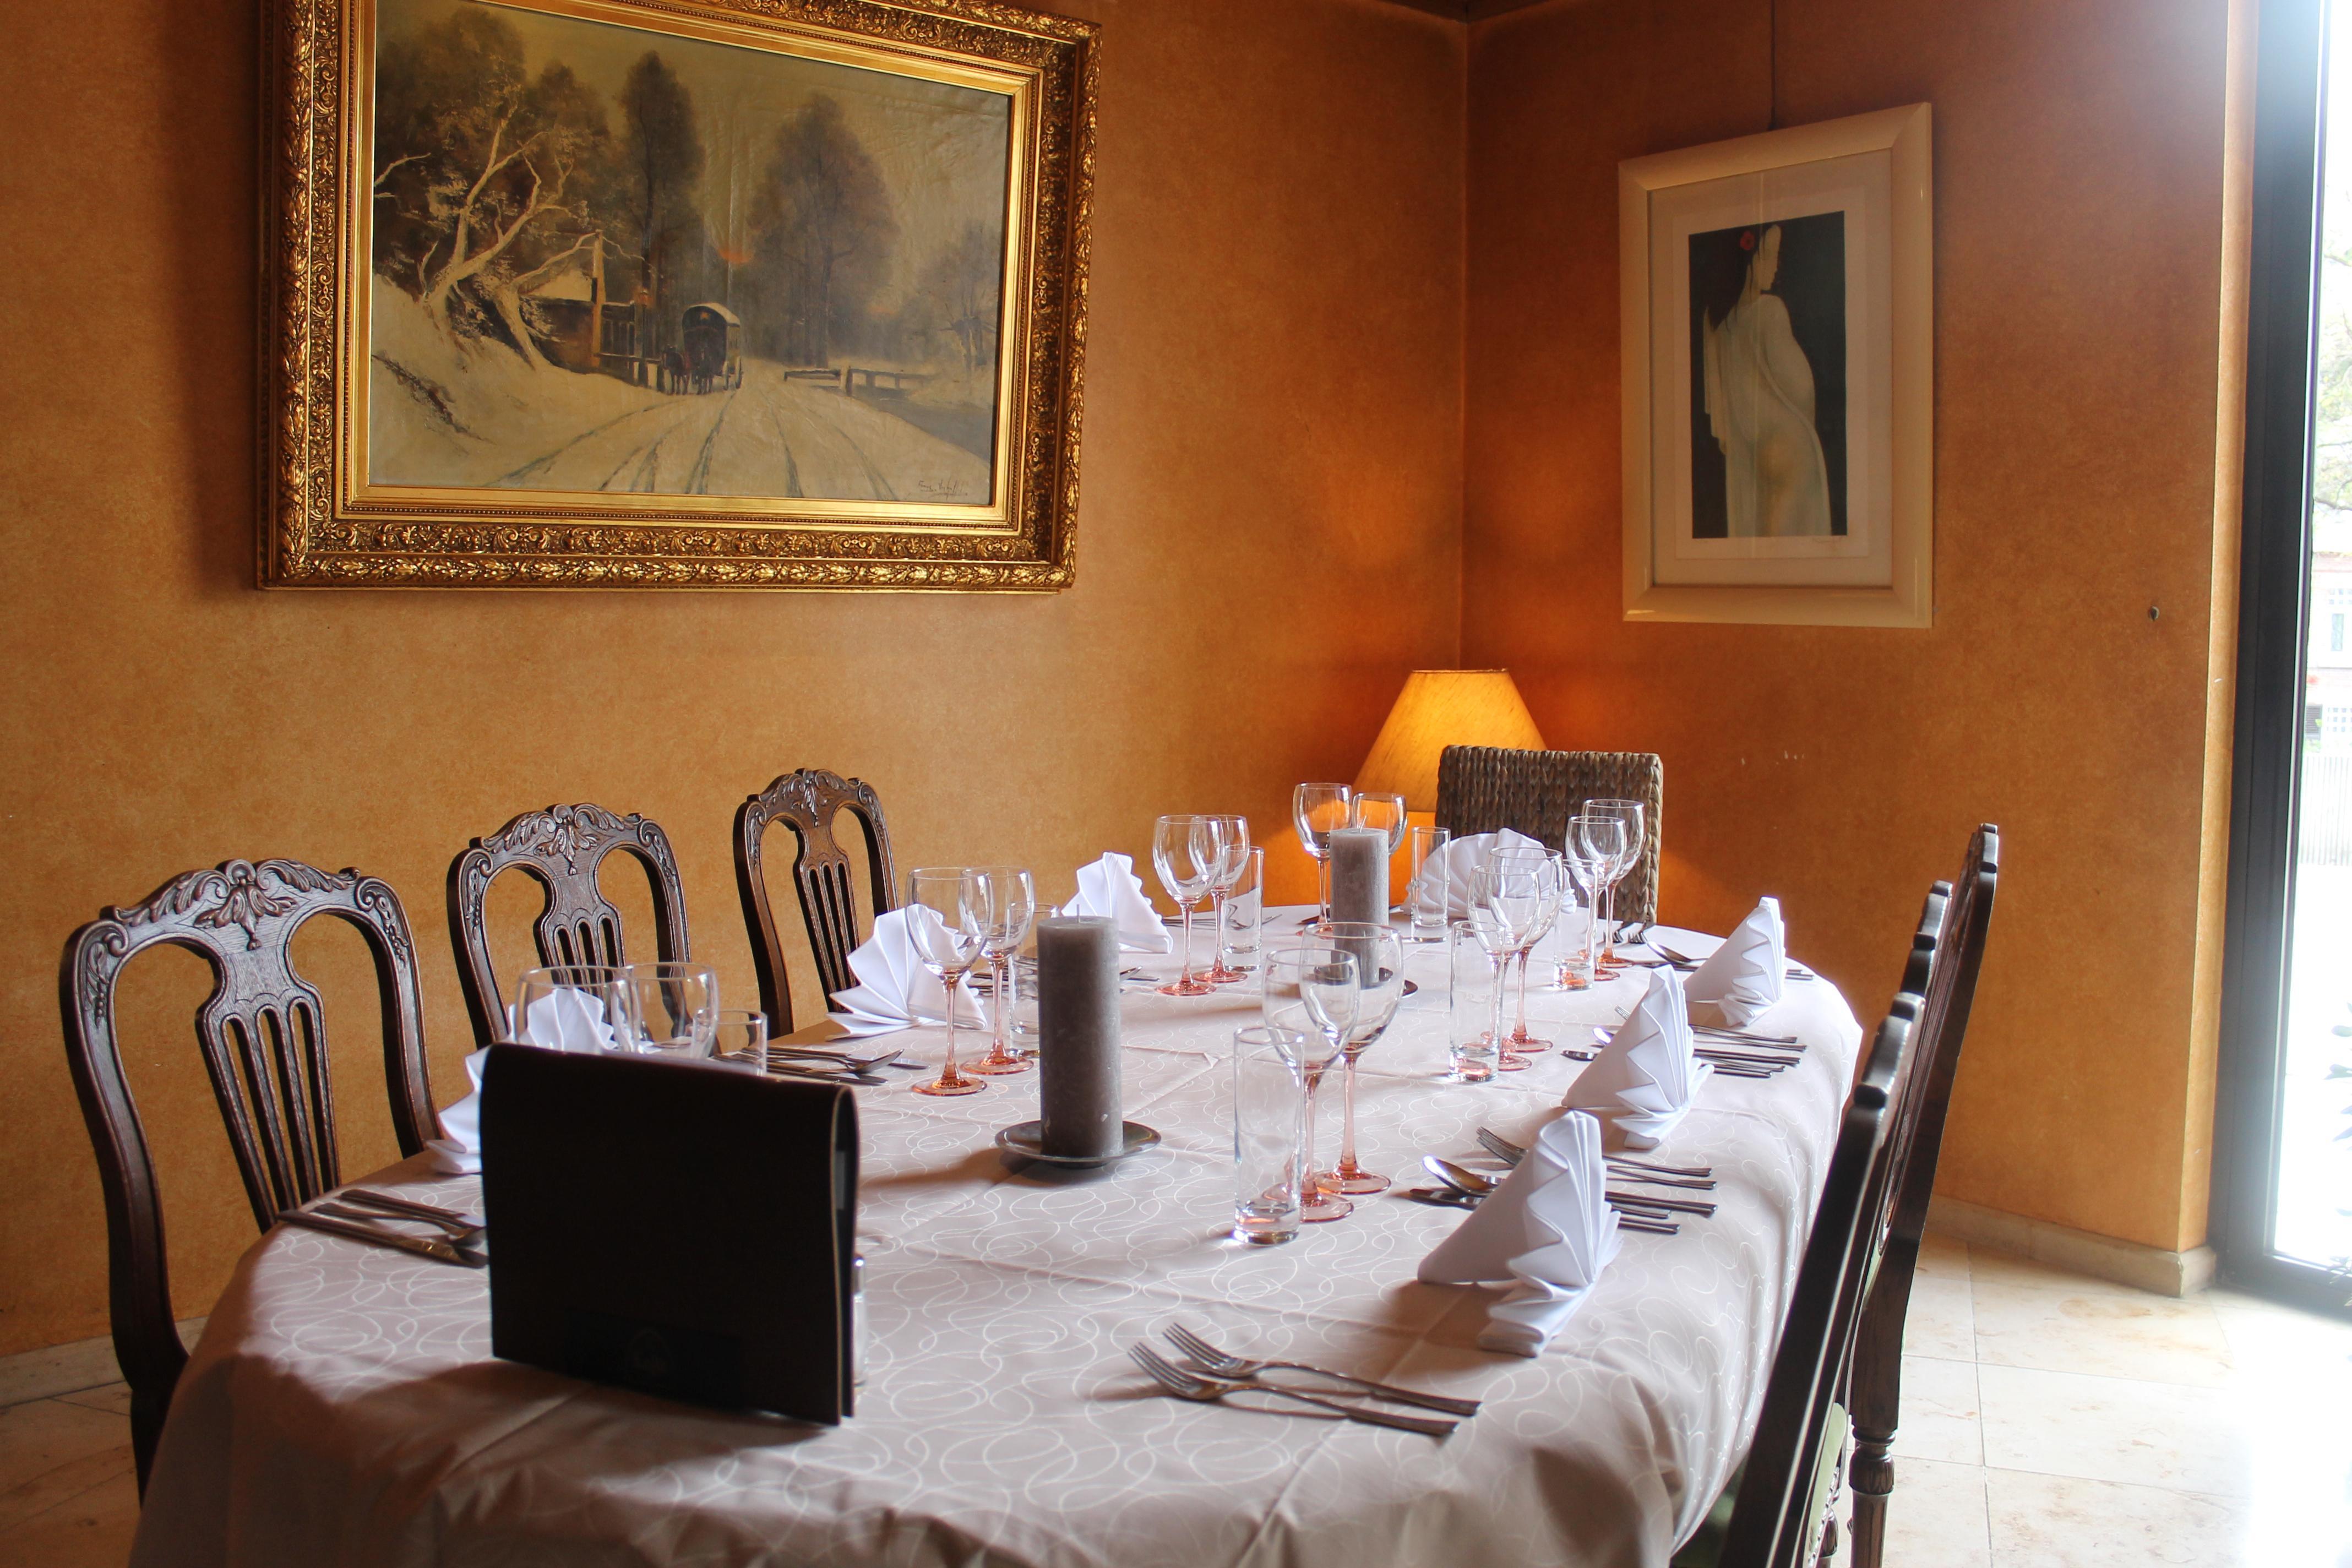 Brasserie Lorraine in Genk